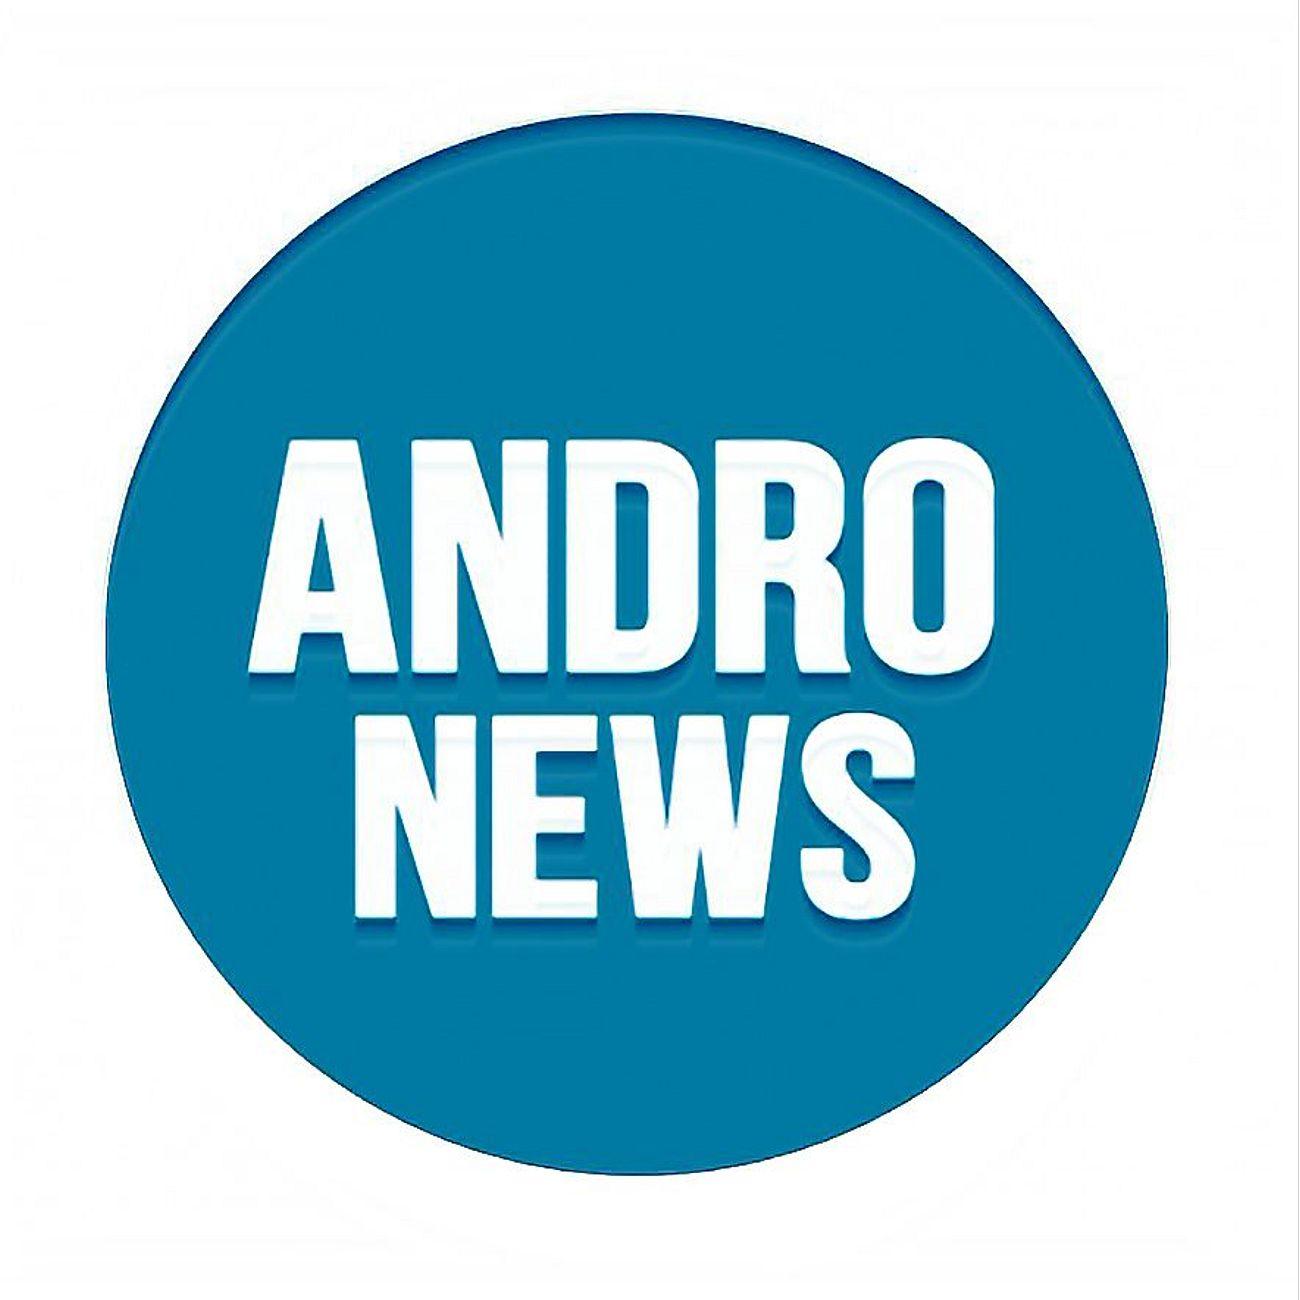 Andro-news